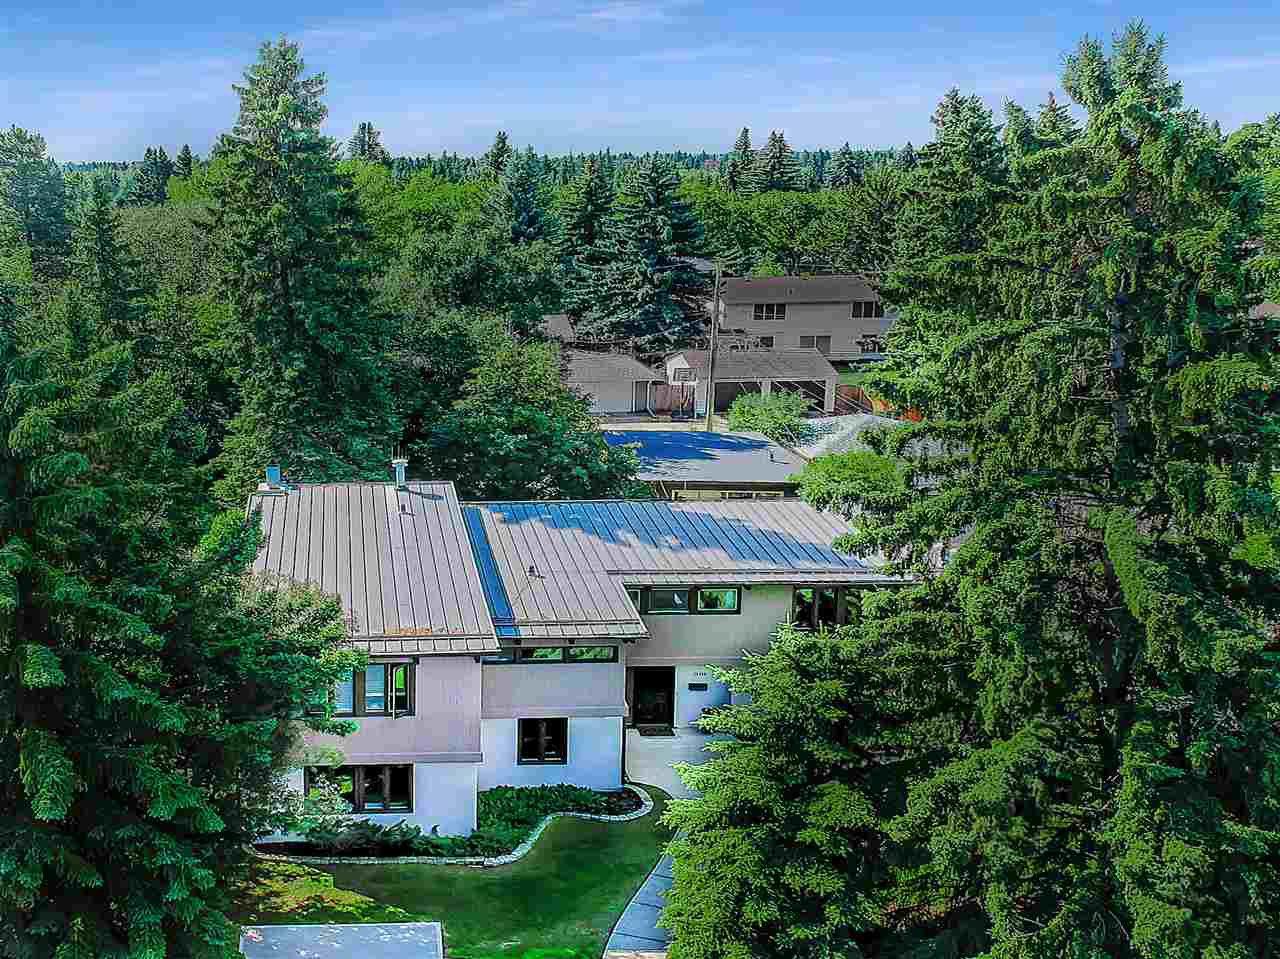 Main Photo: 14011 101 Avenue in Edmonton: Zone 11 House for sale : MLS®# E4169174